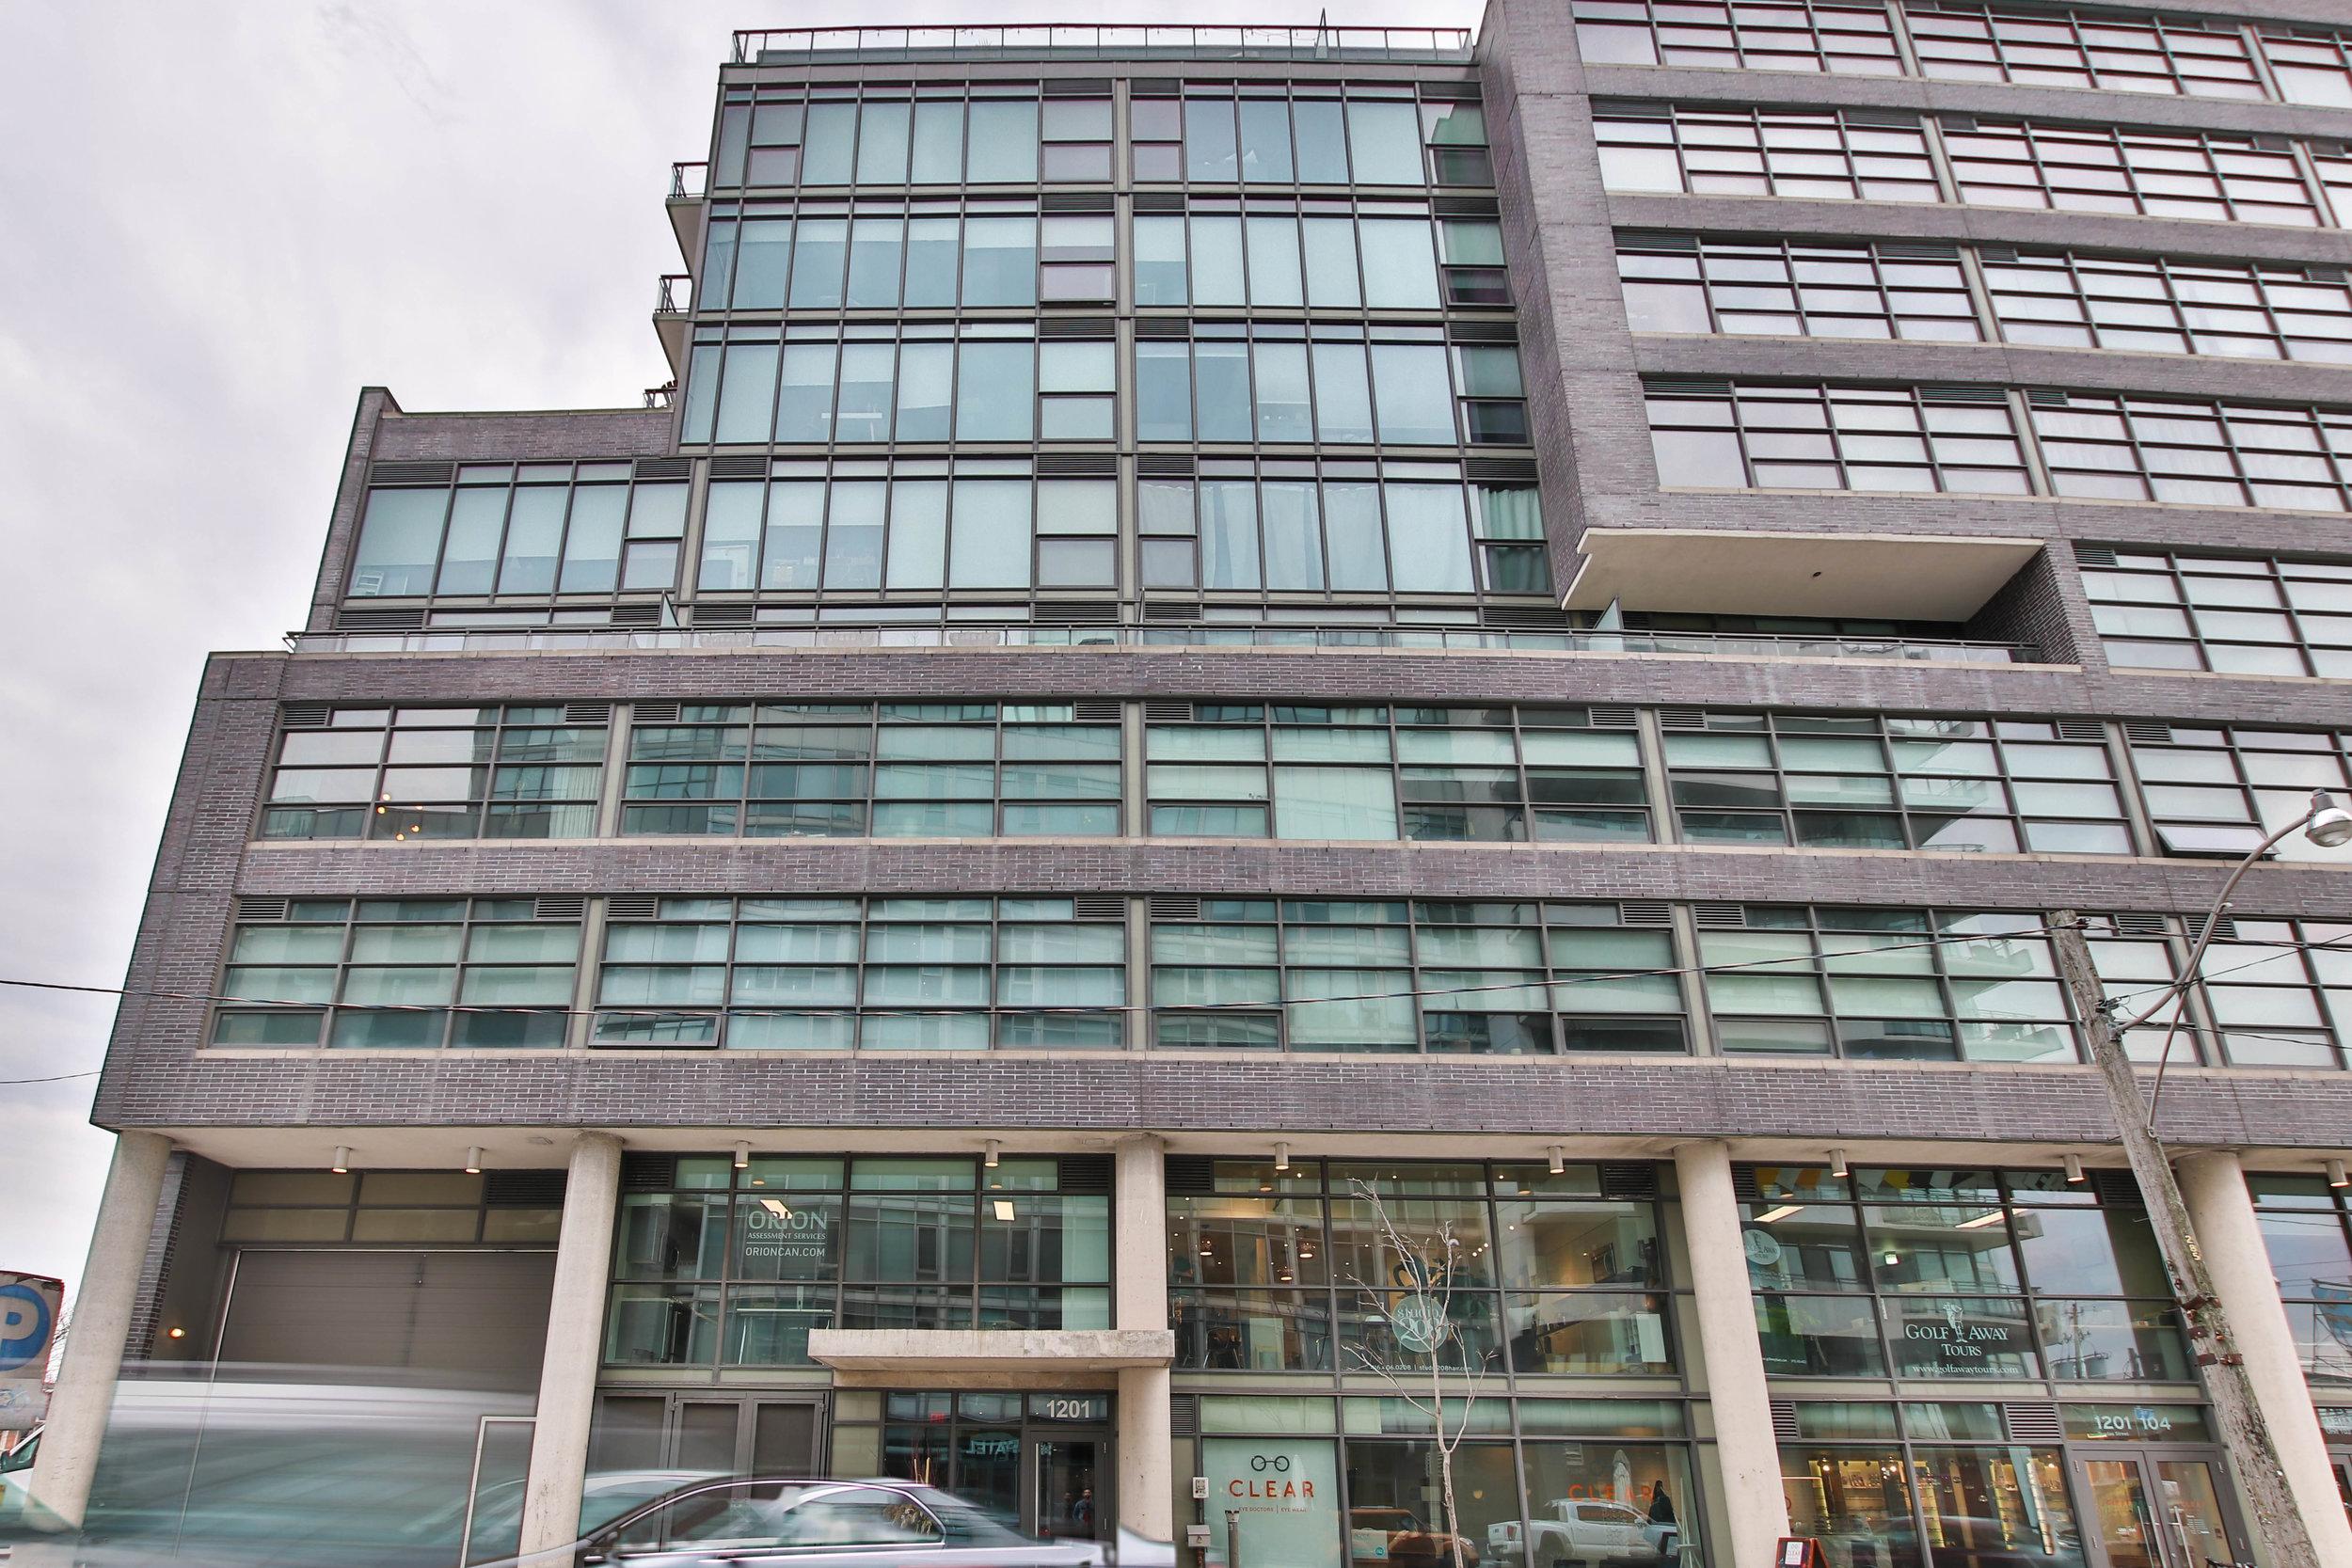 25_Building.jpg